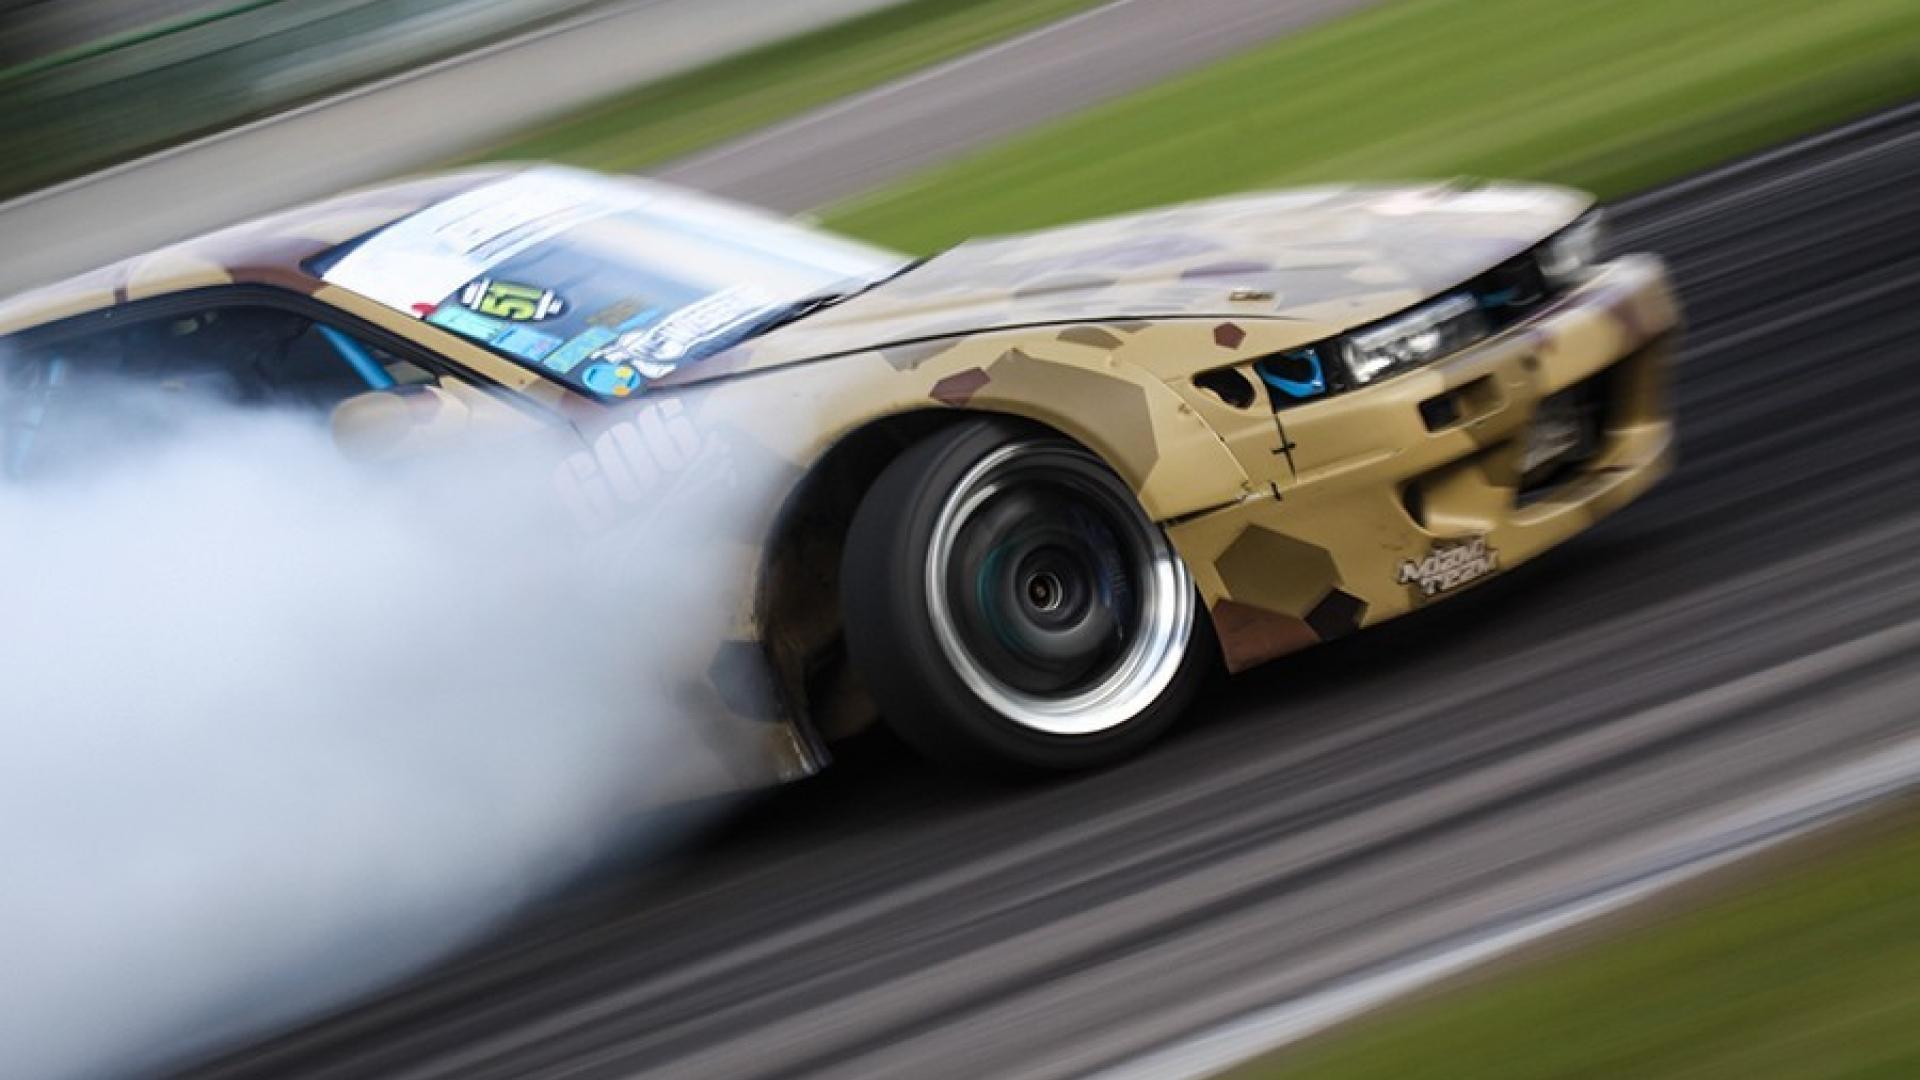 Drift Cars Wallpapers Top Free Drift Cars Backgrounds